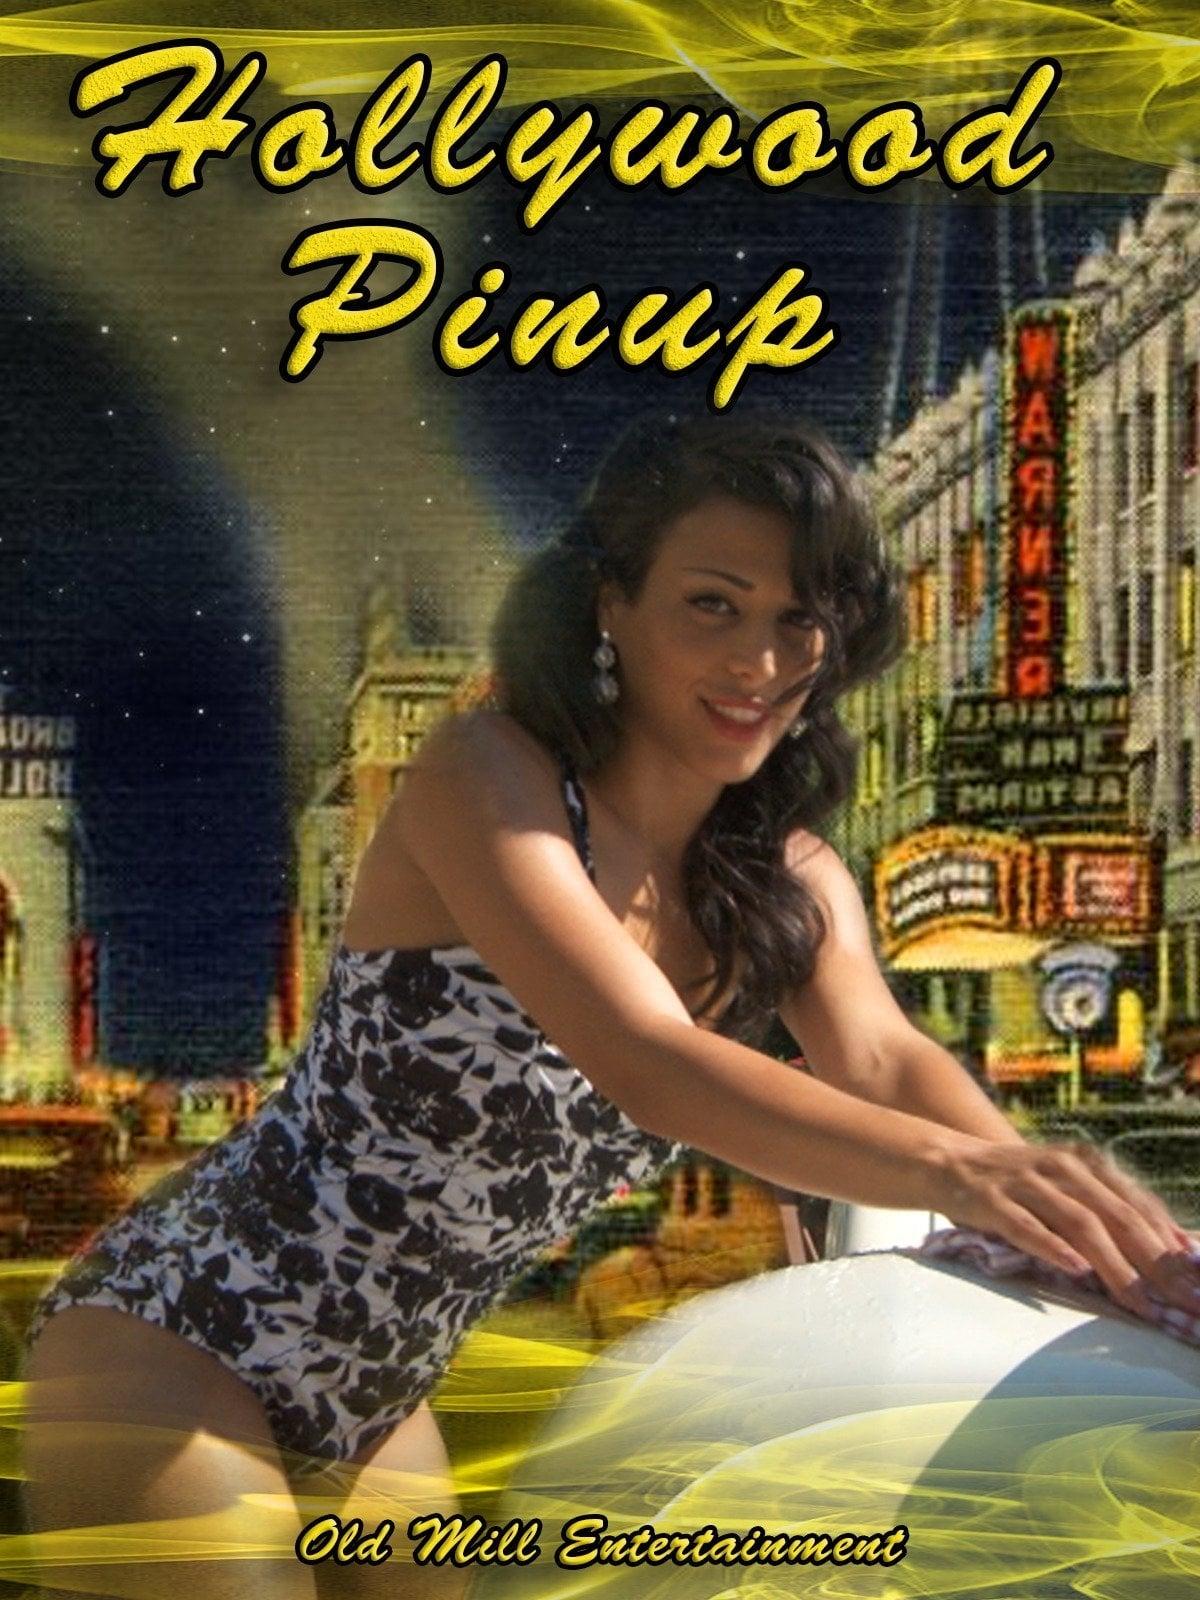 Hollywood Pinup